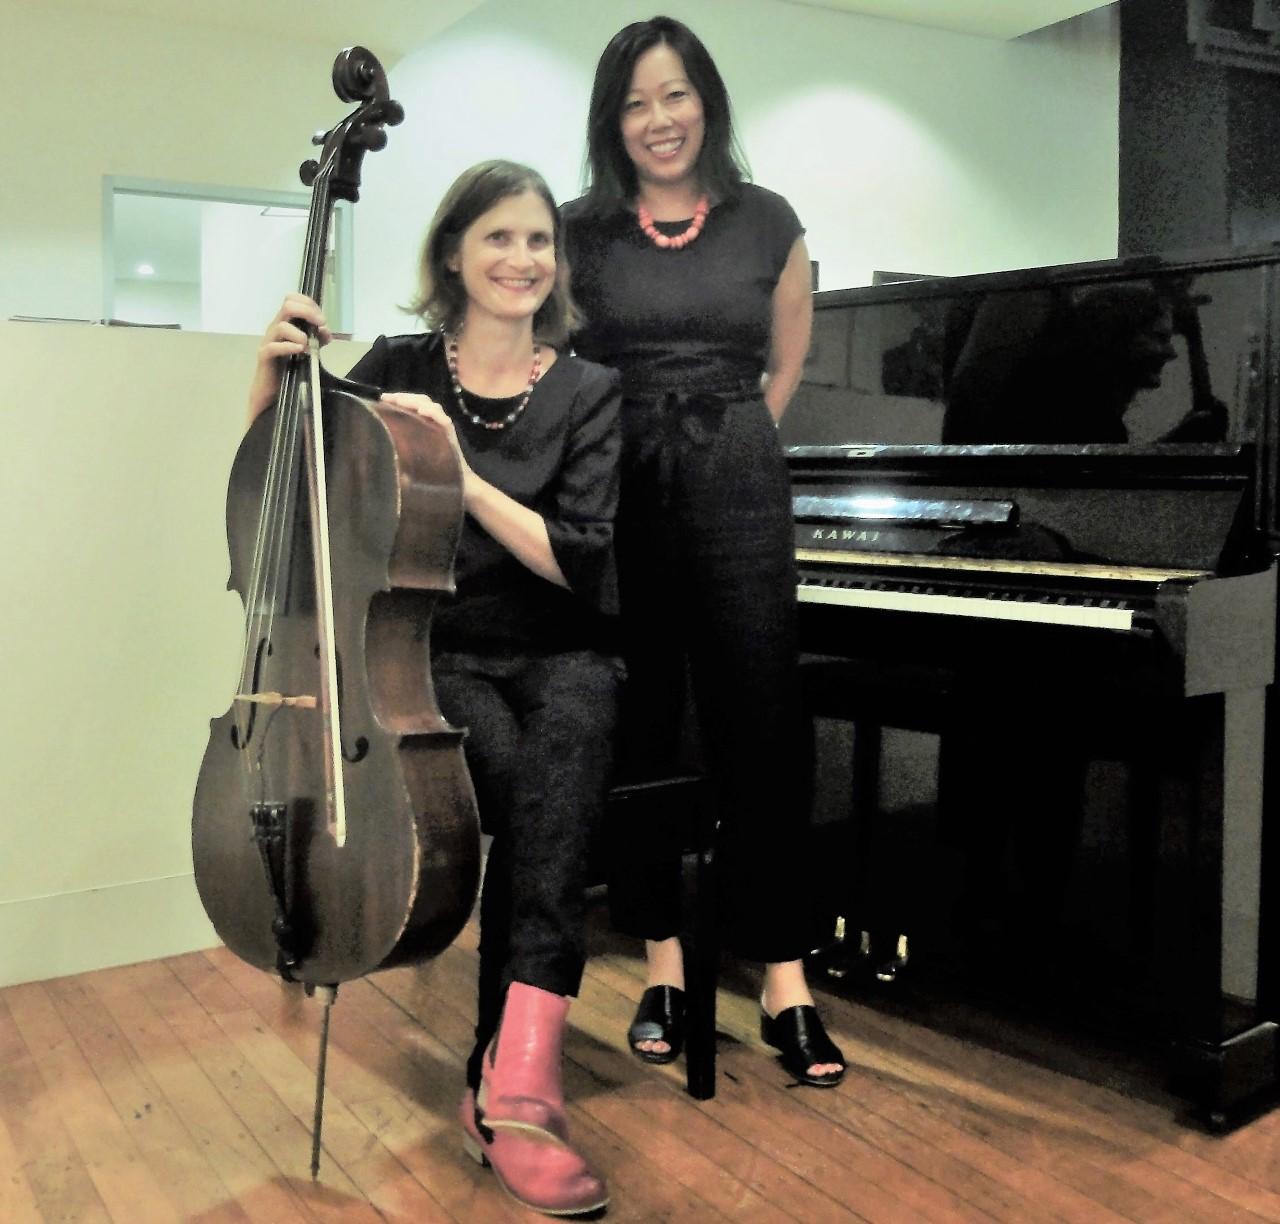 Appasionata cello/ piano duo - New cello/piano duo, performing a range of light classical favourites, tangos, bossa nova and jazz standards. Featuring Adi Sappir on cello.